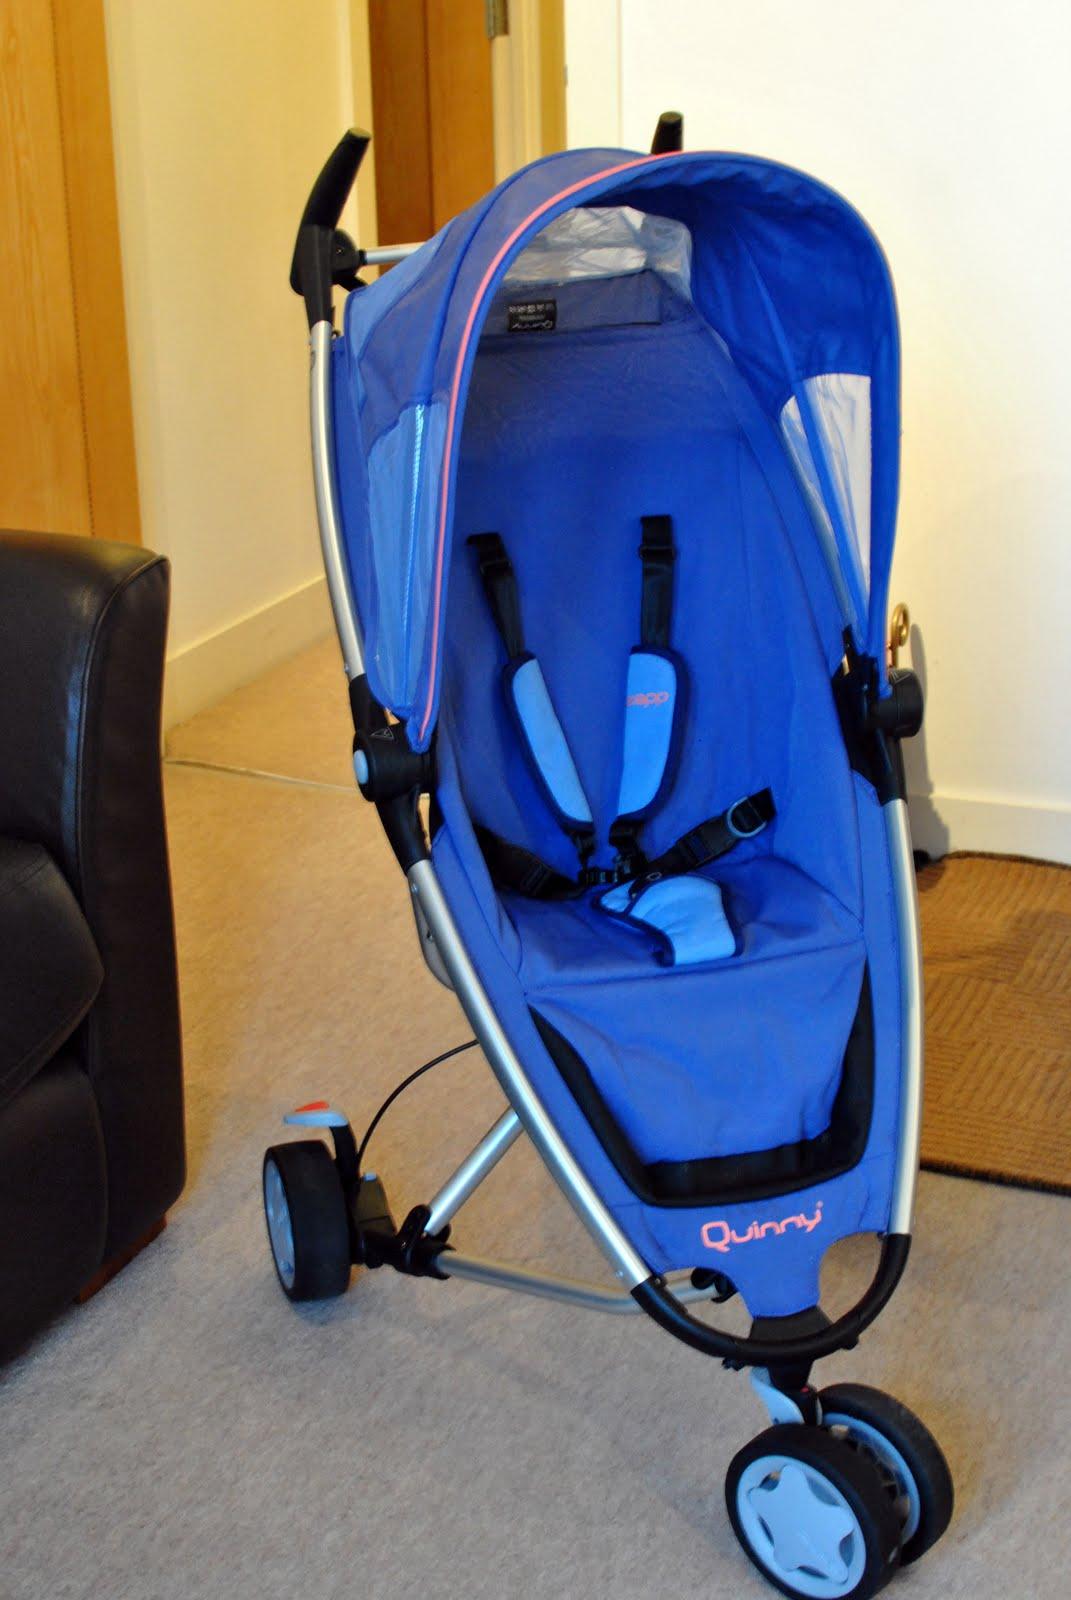 mama shop papa drop quinny zapp stroller electric blue 2010 edition. Black Bedroom Furniture Sets. Home Design Ideas